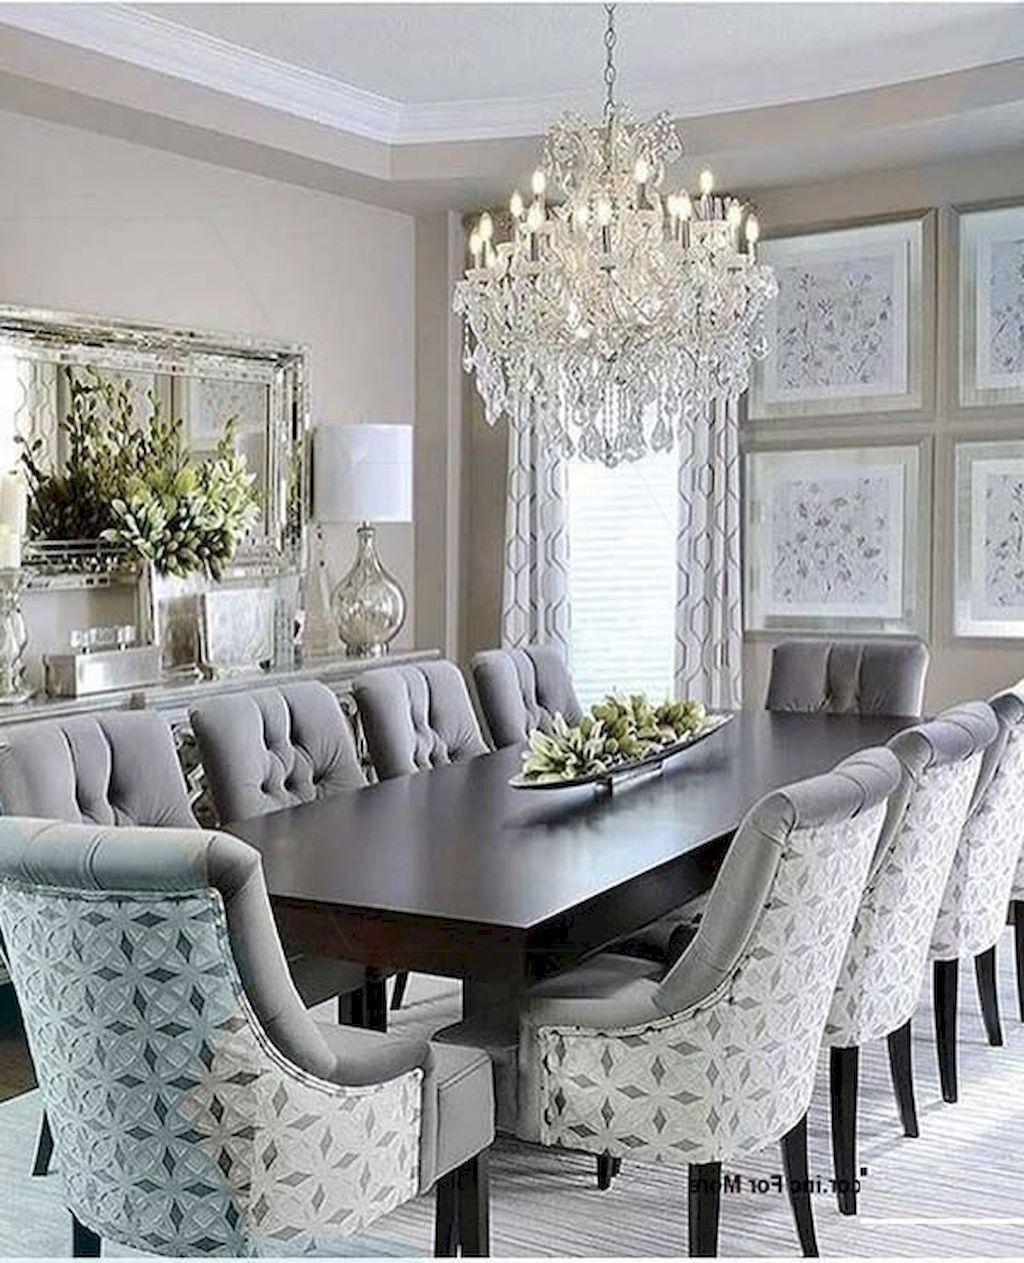 35 Luxury Dining Room Design Ideas: Best Tips Choosing Dining Room Furniture